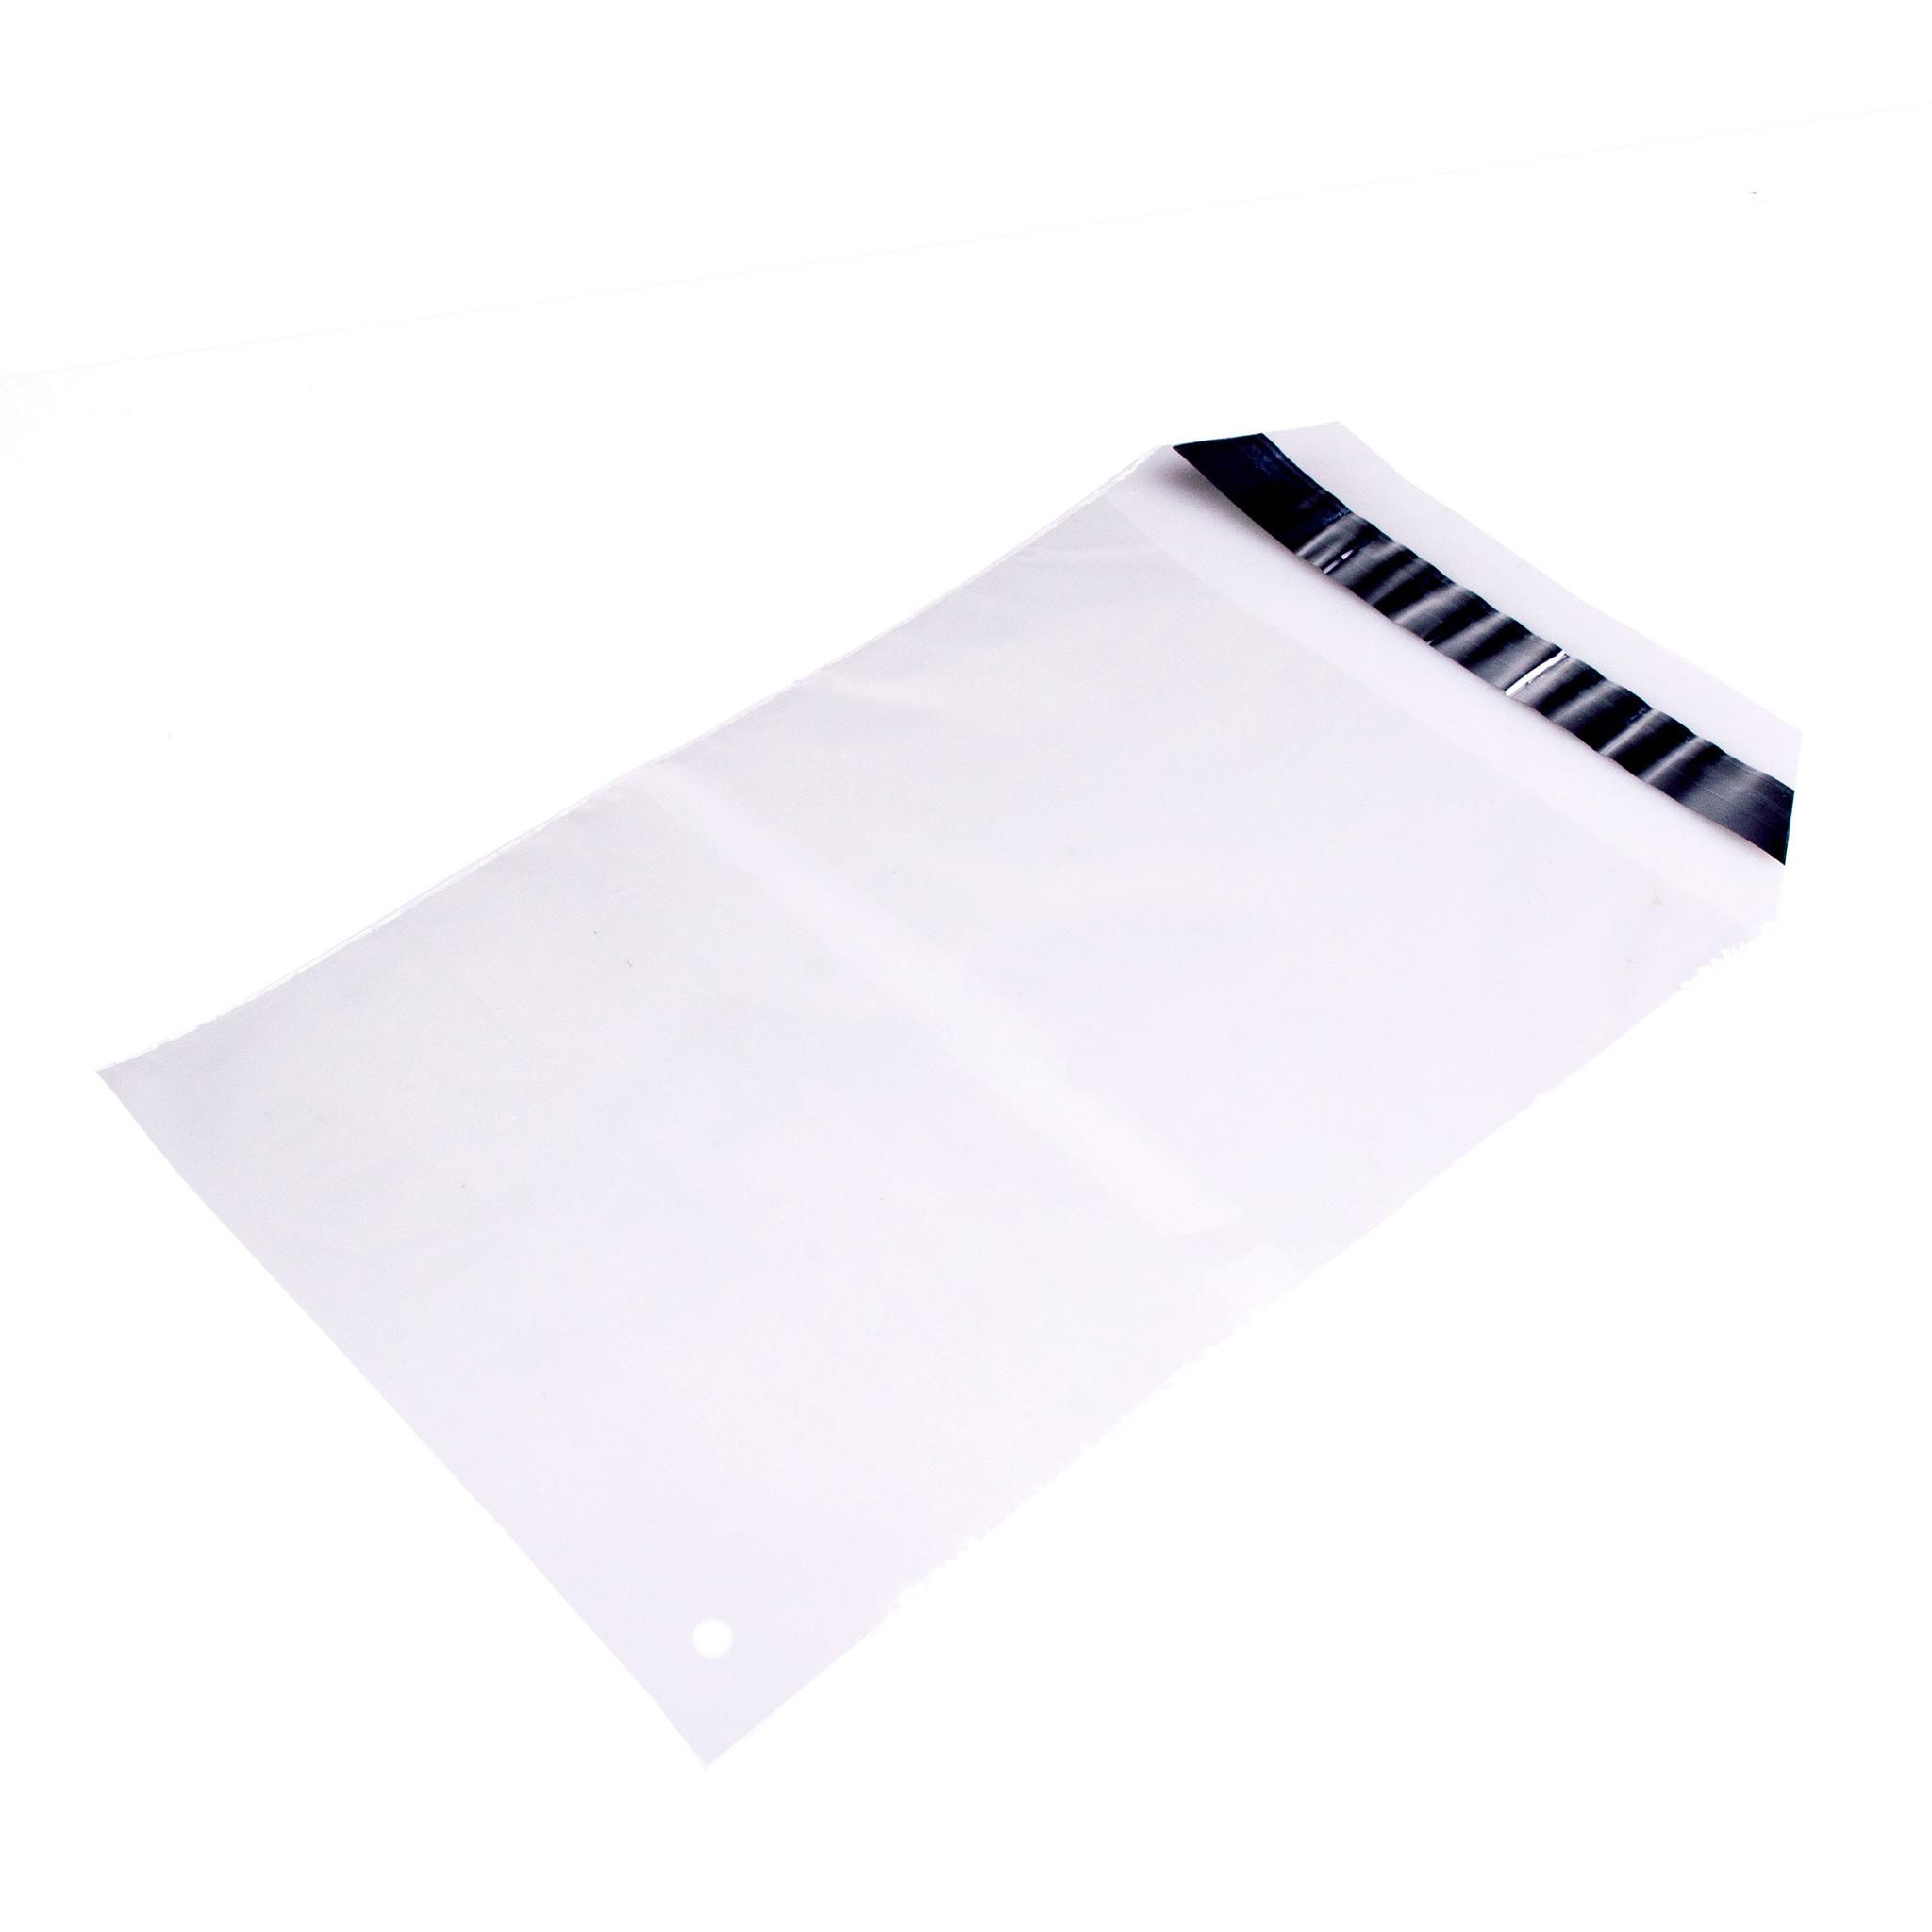 Mailing envelop 235 x 325 + 50 mm uit 70 micron LDPE pakje van 100 stuks